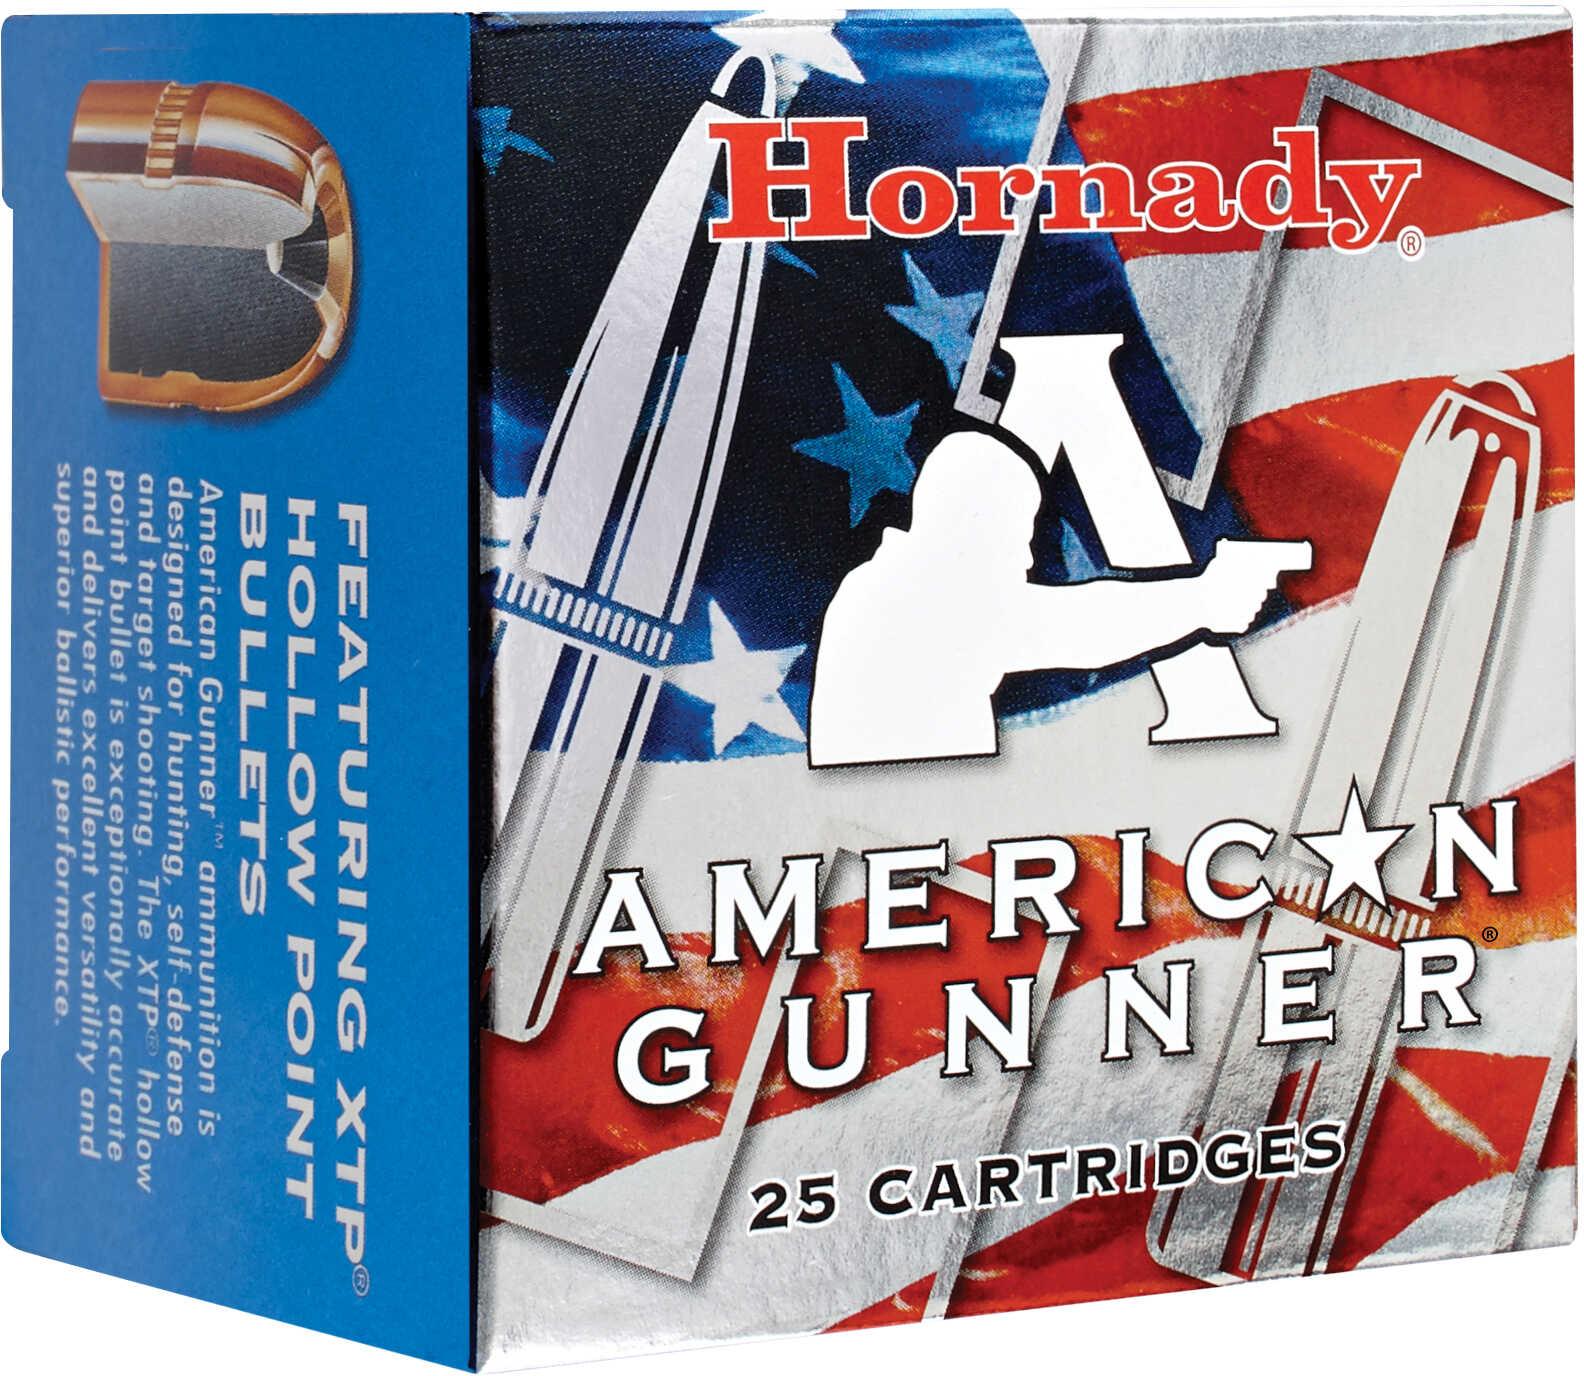 Hornady 357 Magnum 125 Gr, XTP, American Gunner (Per 25) Md: 90504